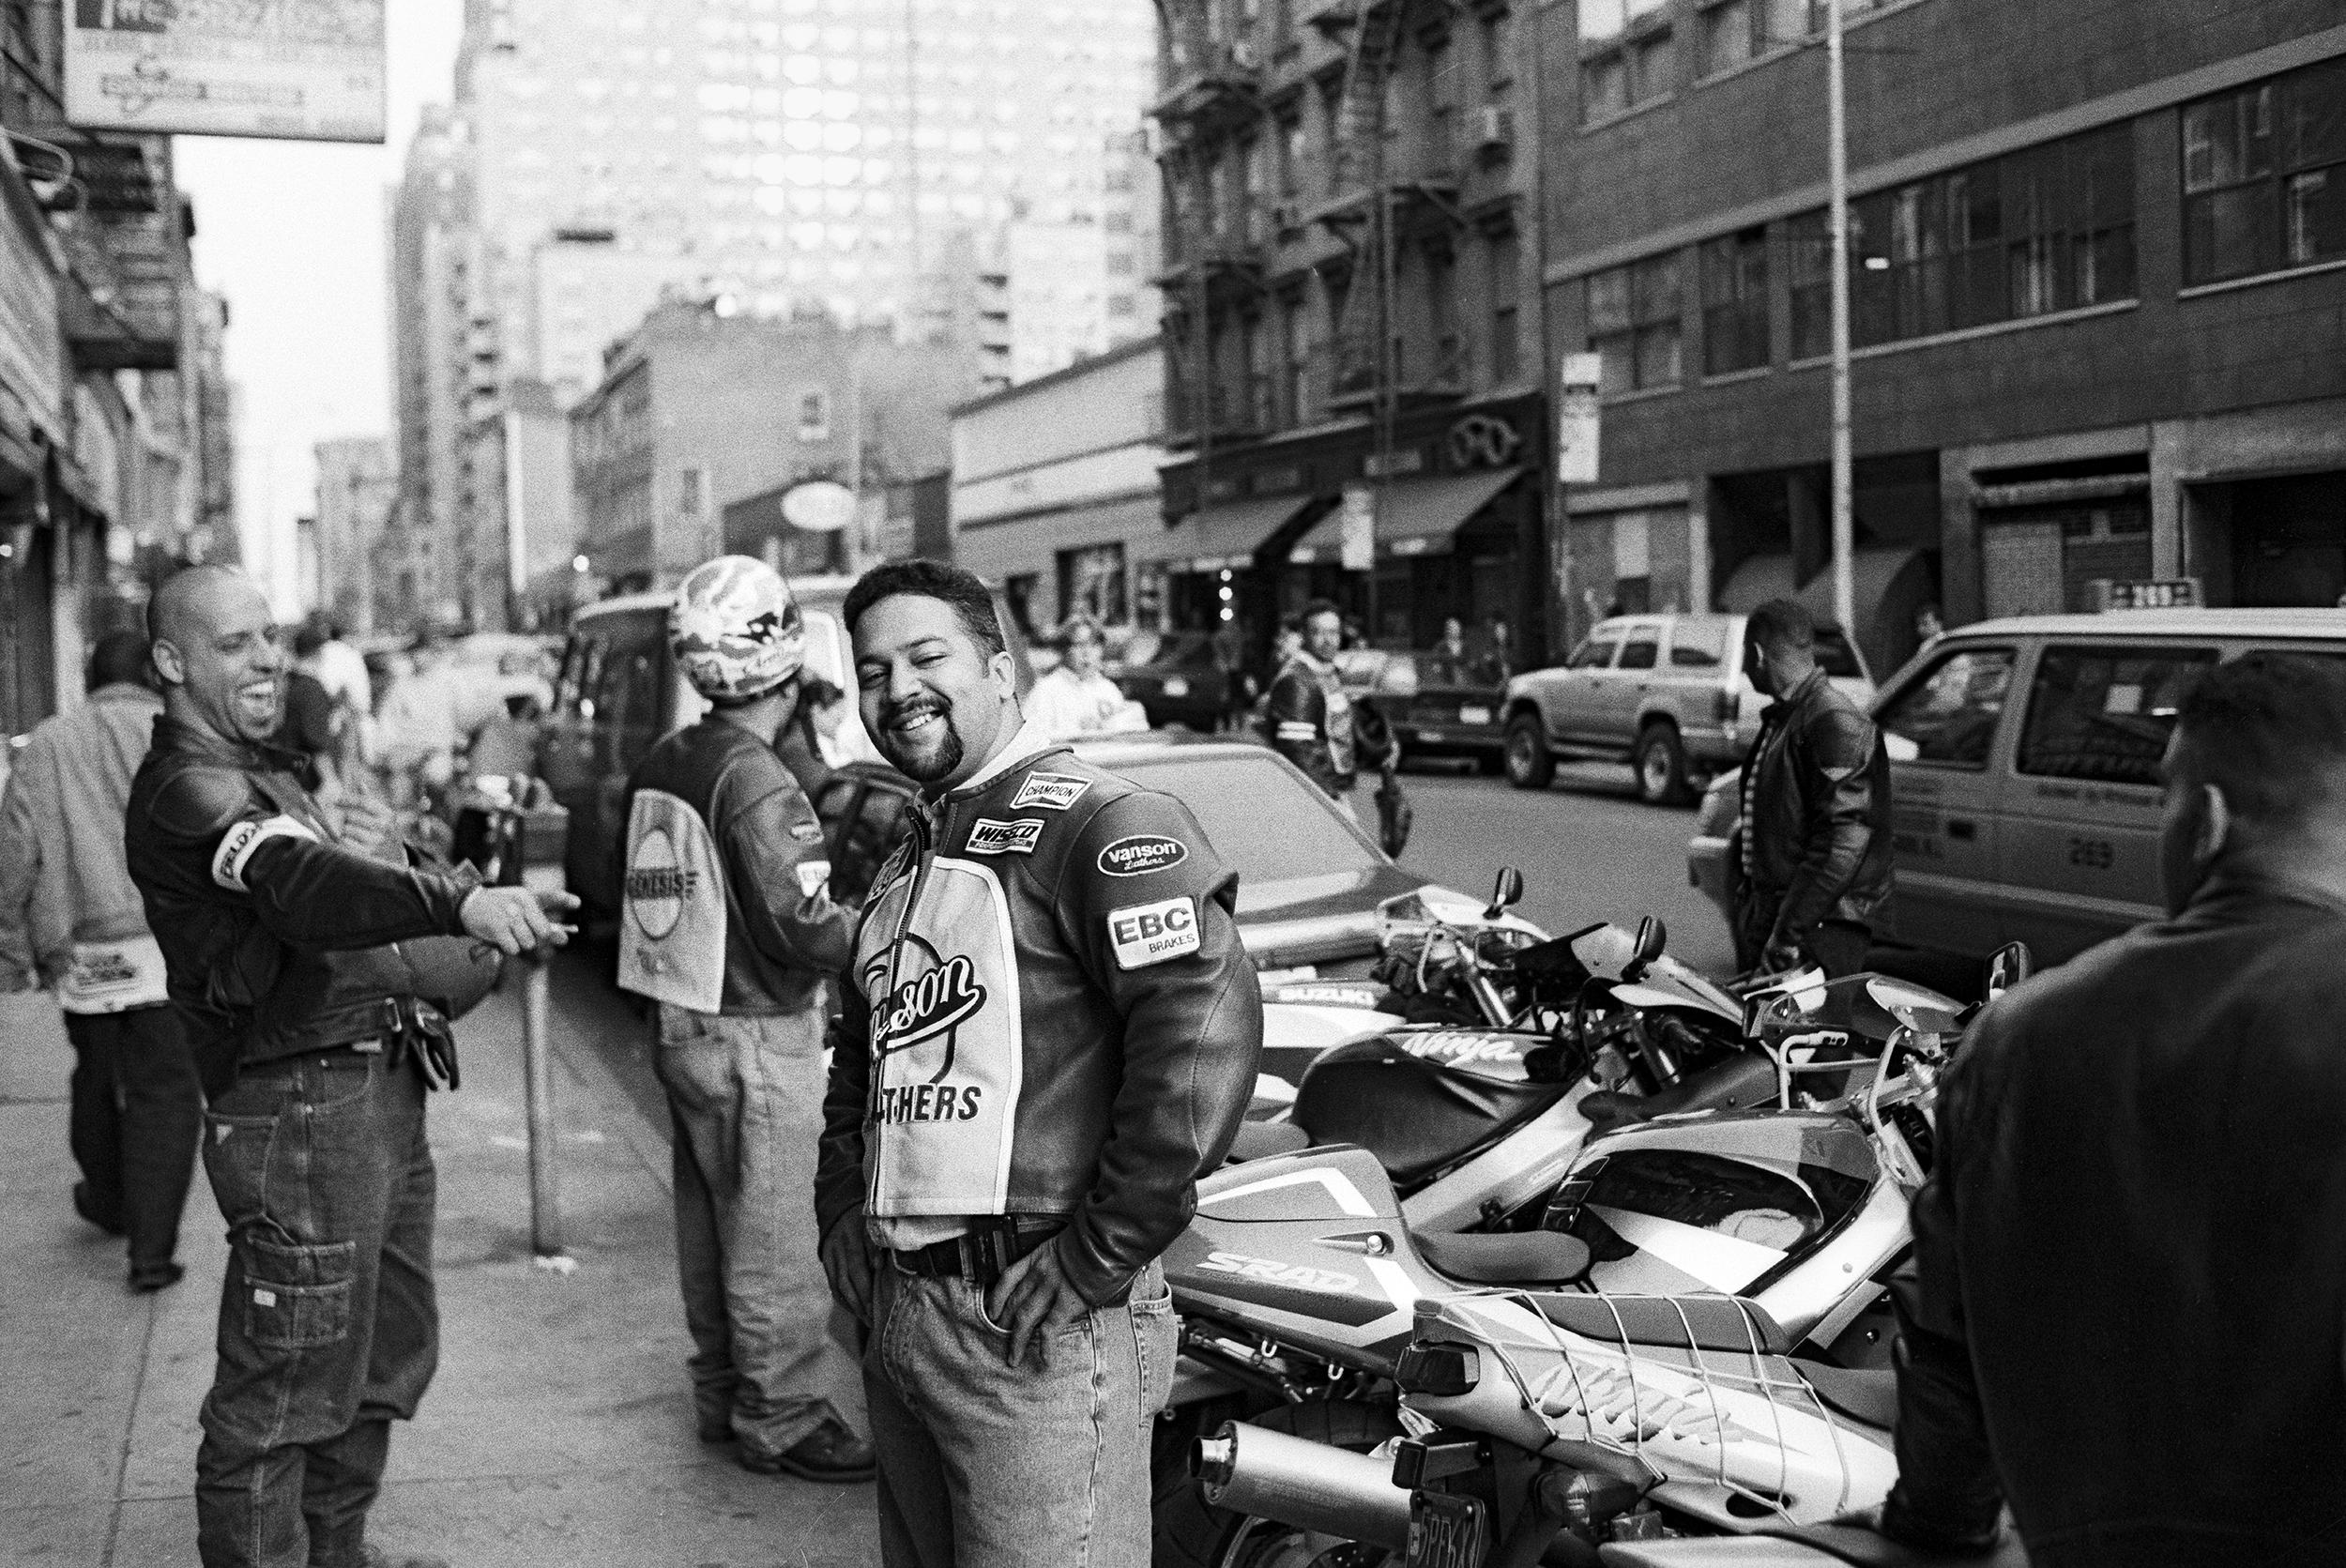 Biker - New York